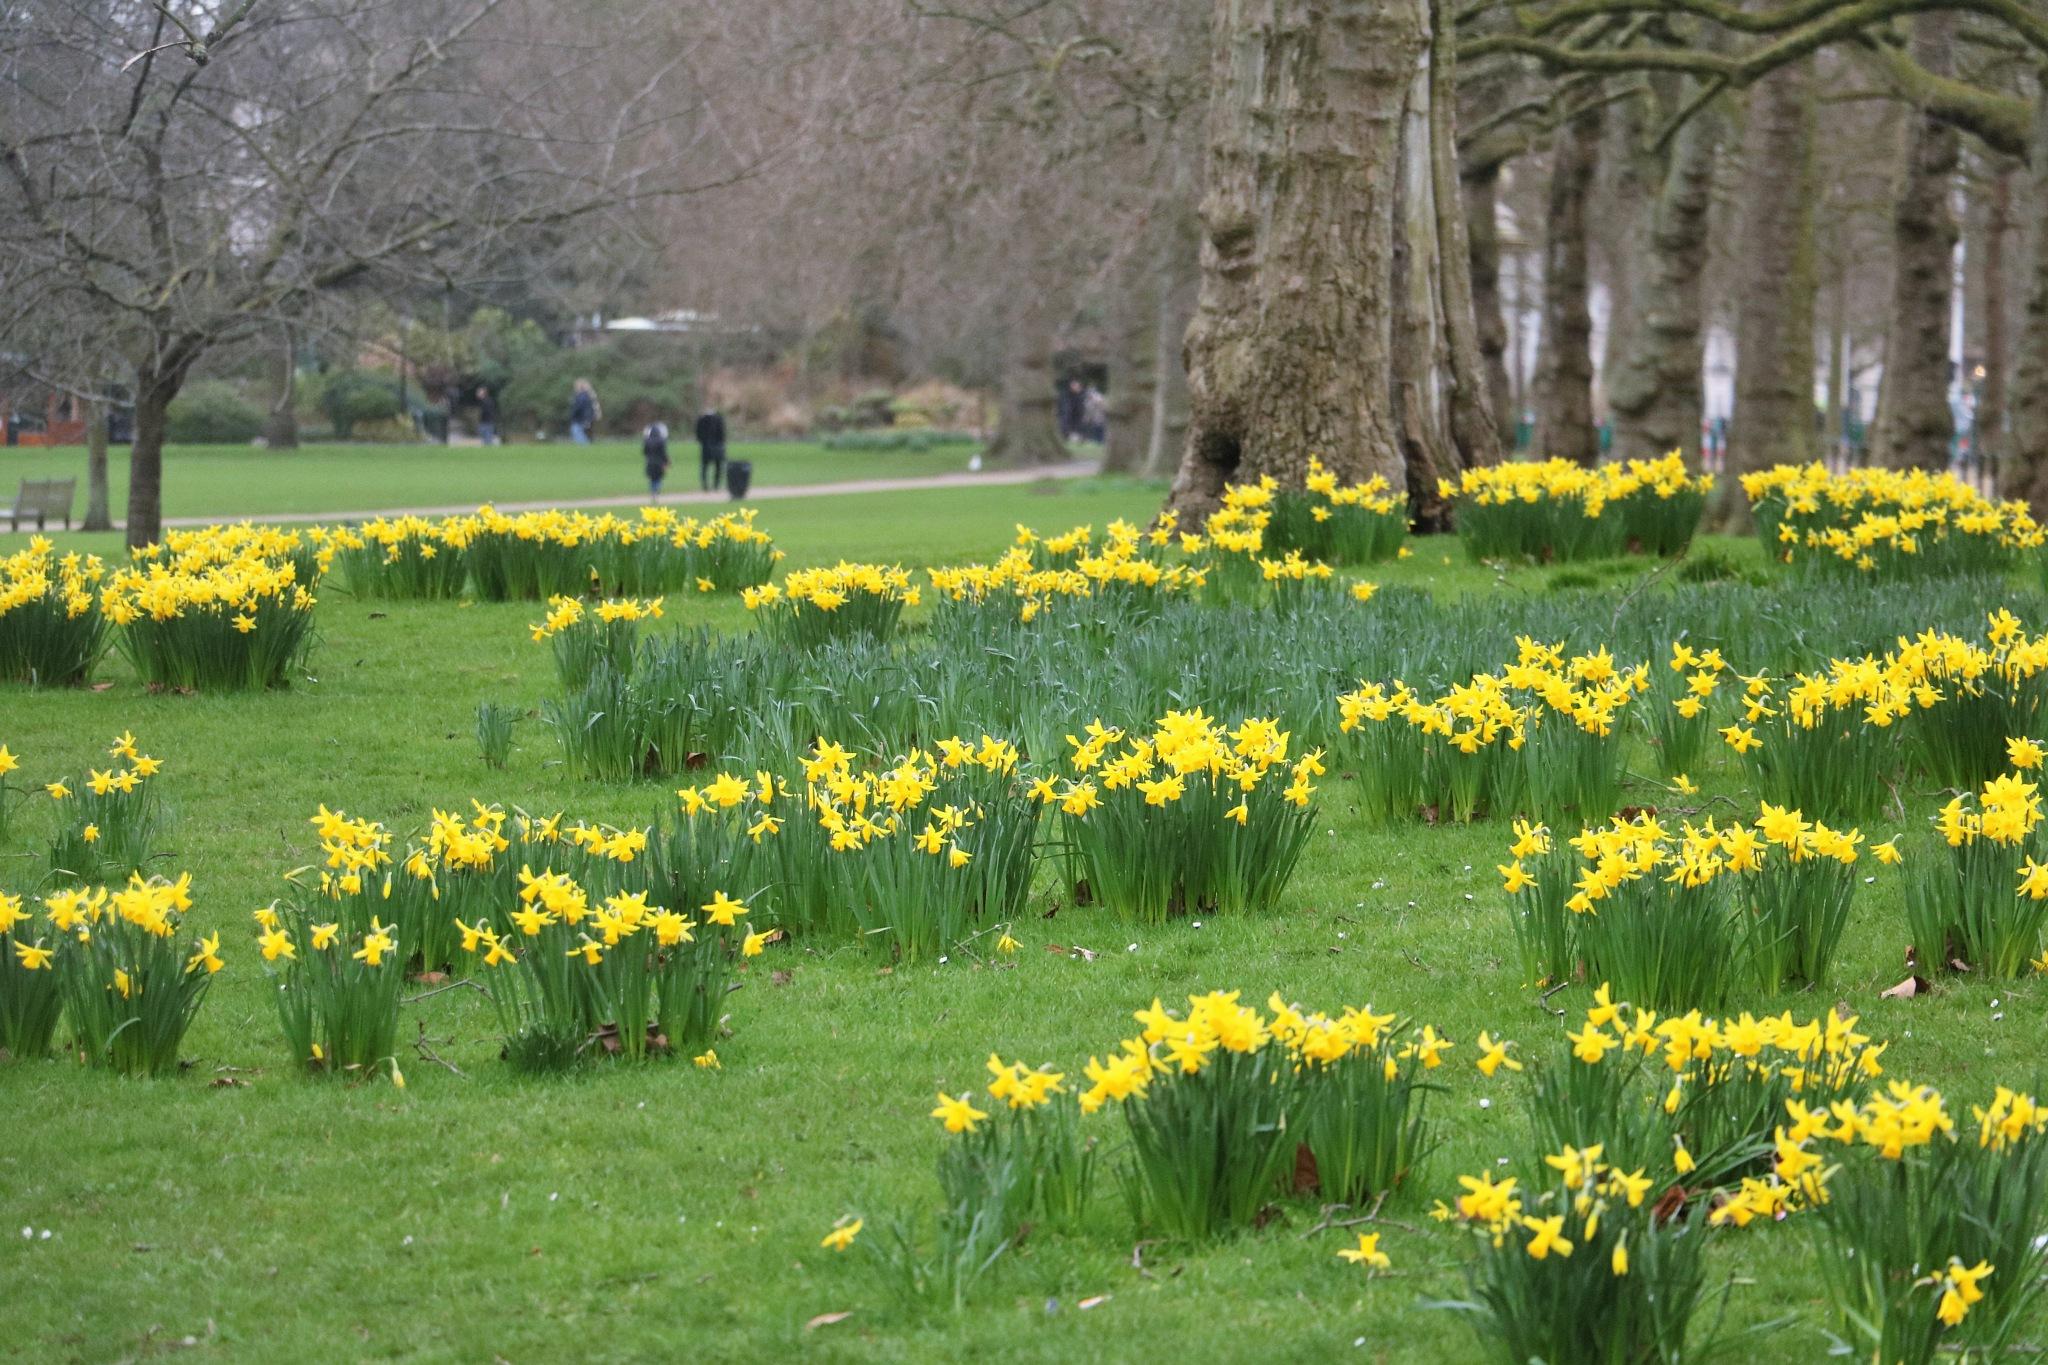 Springtime at St. James by ken.pearce.9406